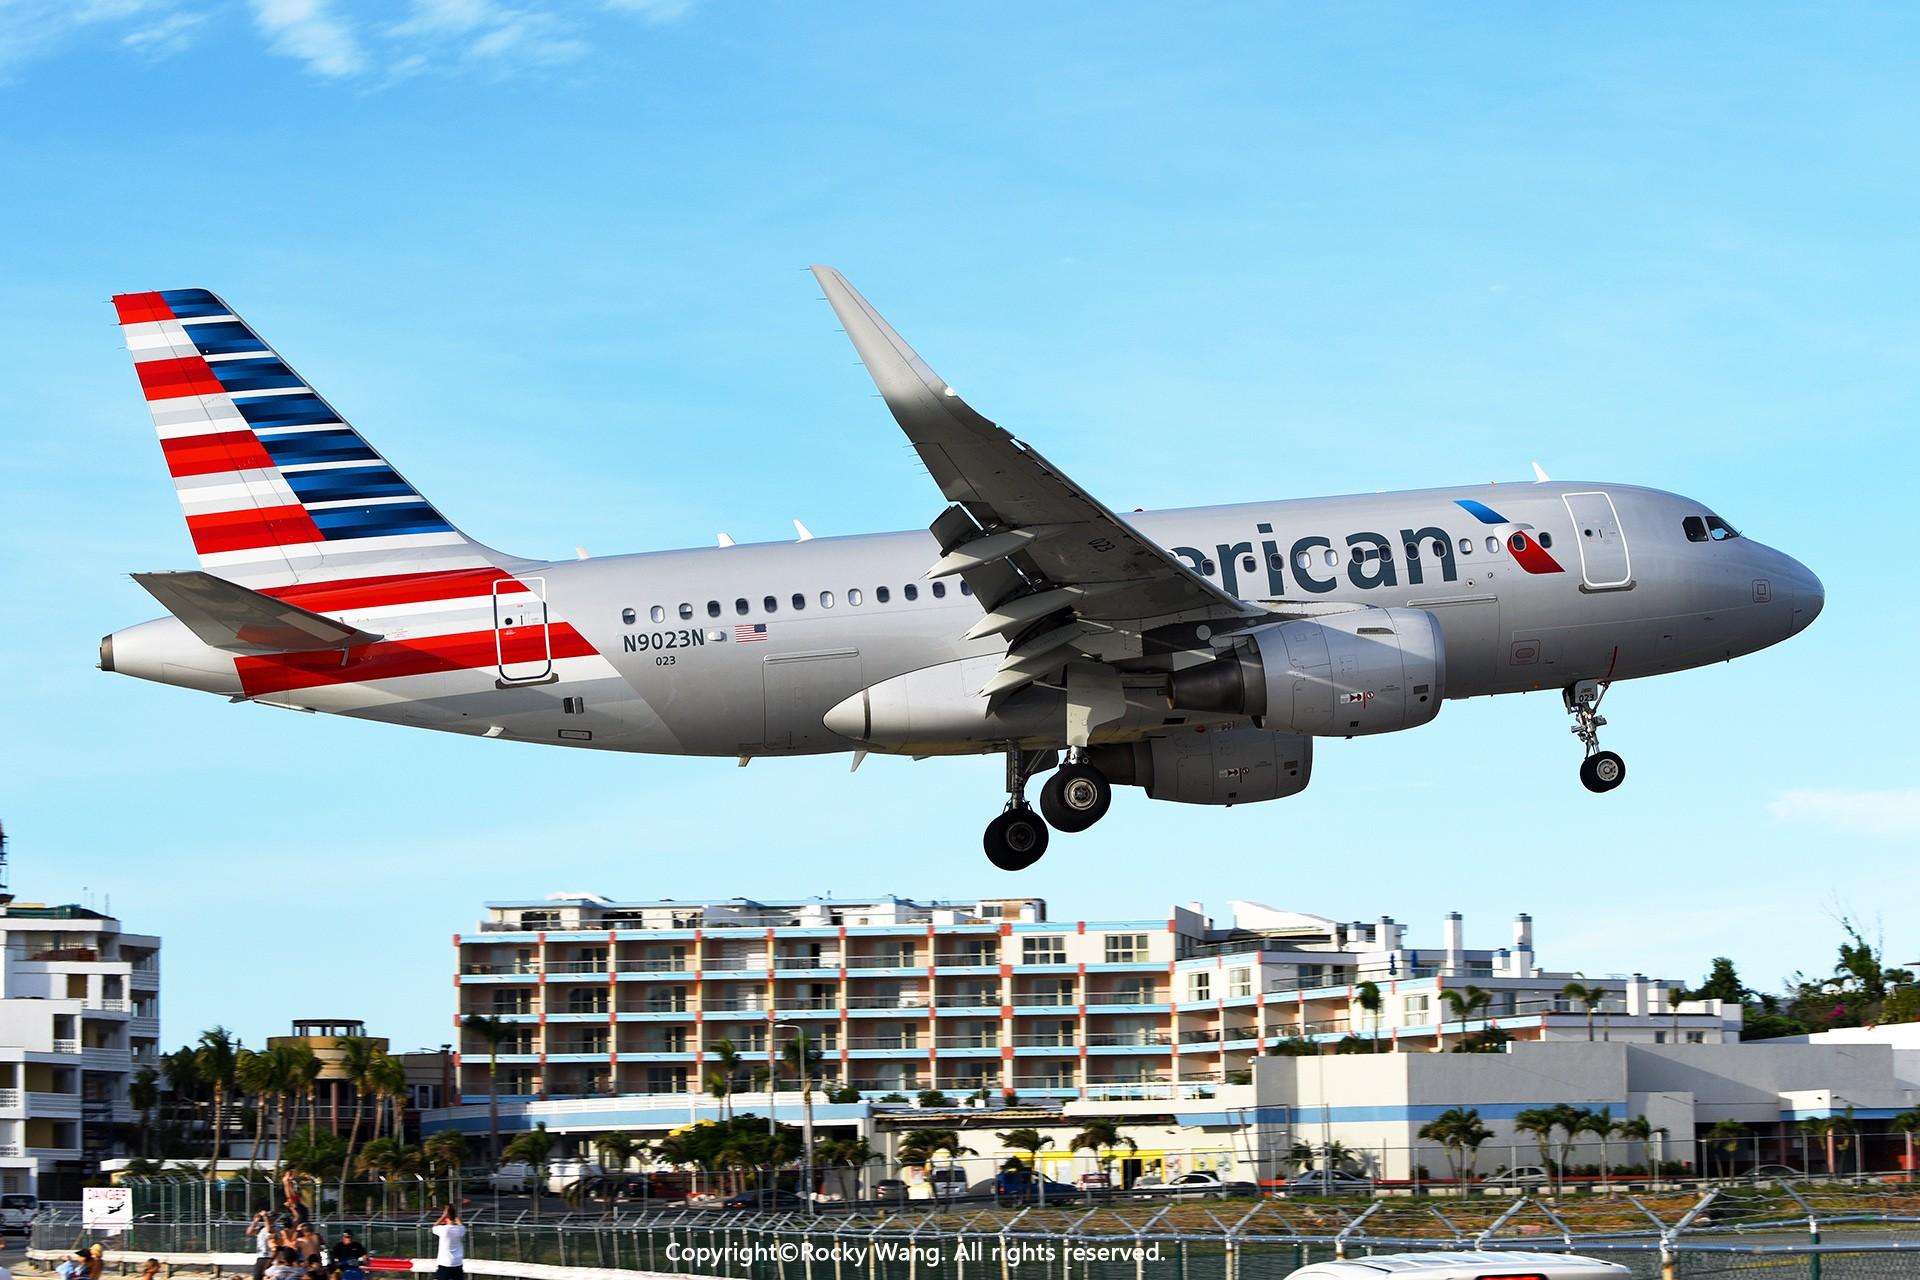 Re:[原创]My endless Caribbean dream——圣马丁朱莉安娜公主机场拍机记 AIRBUS A319-115 N9023N 荷属安的列斯群岛朱利安娜公主机场